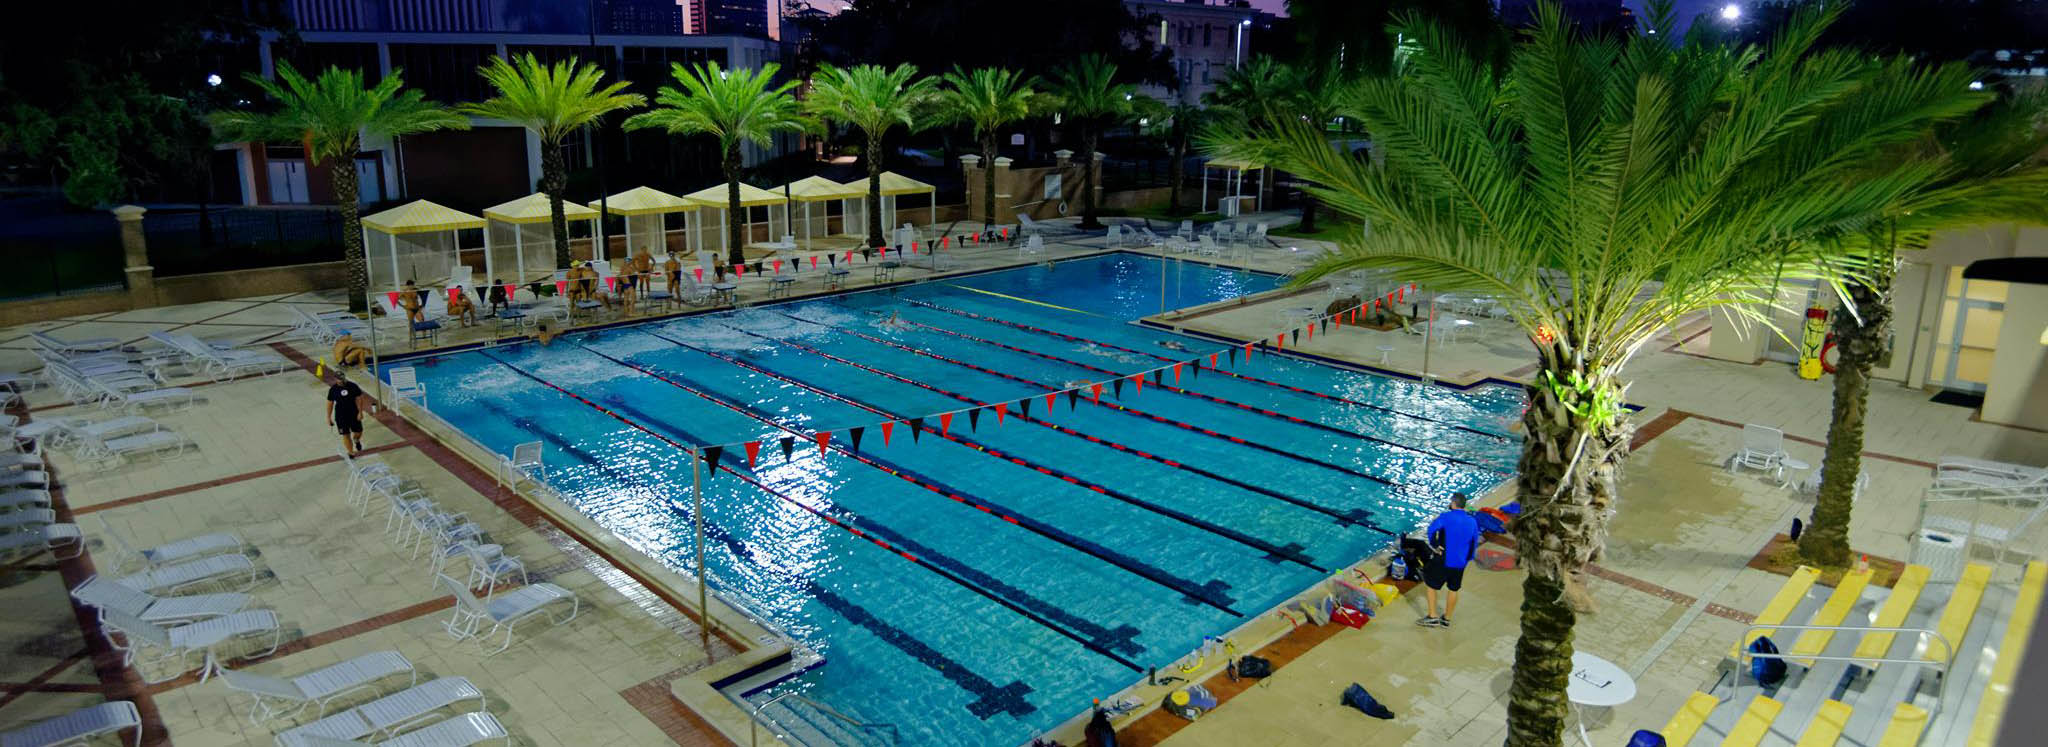 University of Tampa pool photo